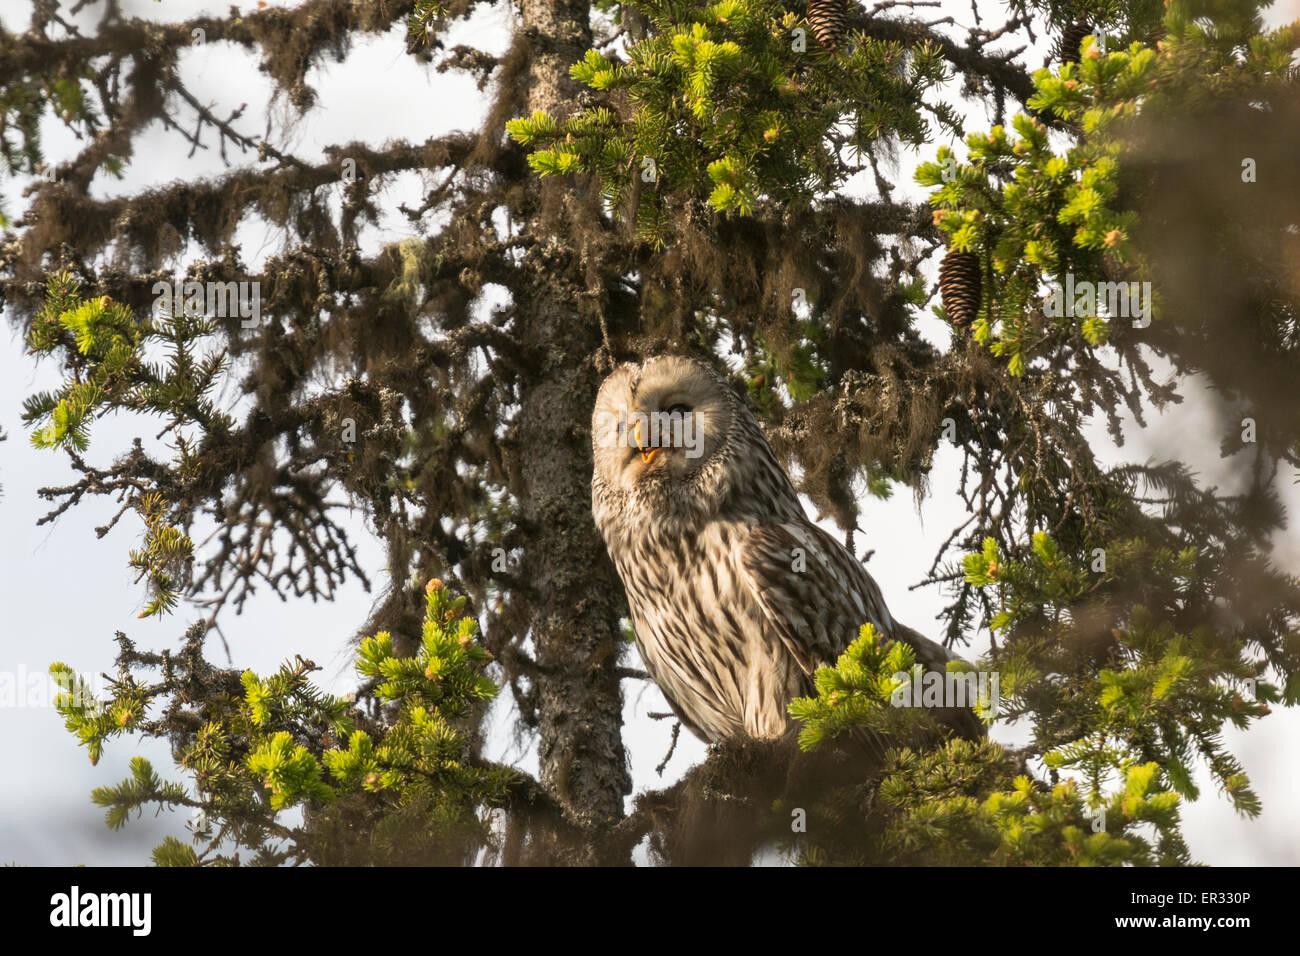 Ural owl, Strix uralensis, sitting in a spruce - Stock Image